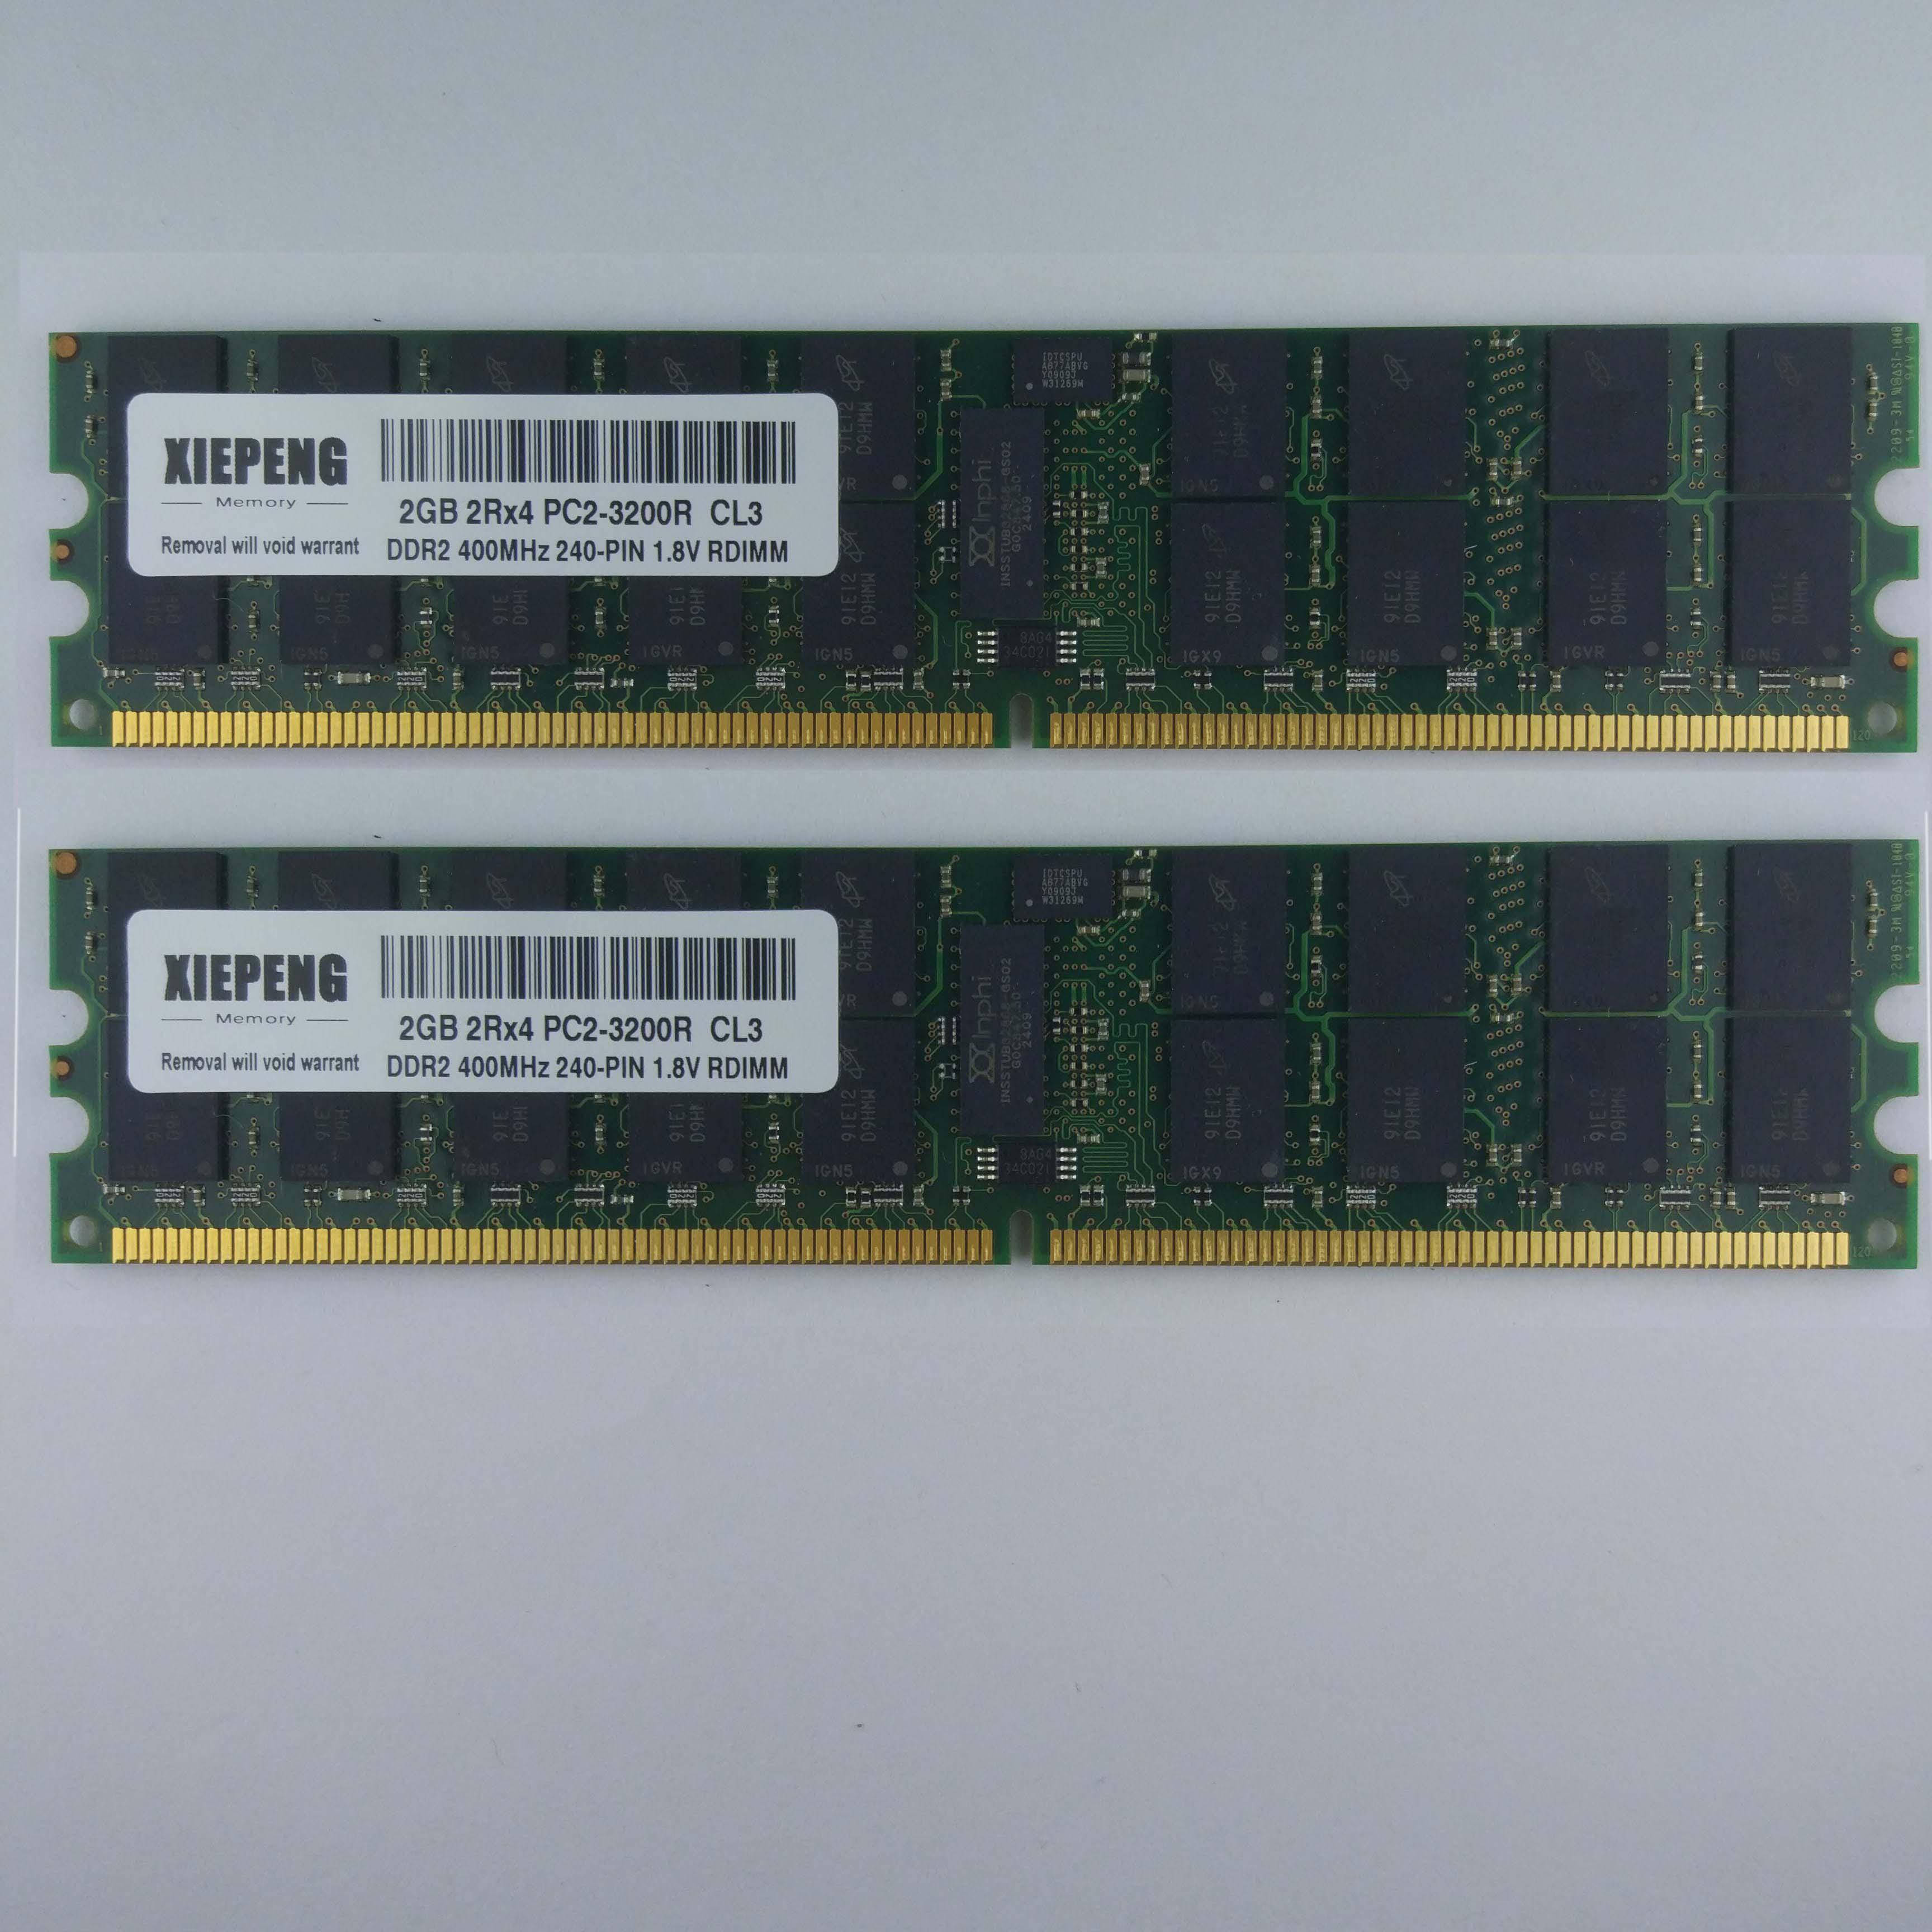 IBM eServer 260x8865x336x1879x346-1880 servidor RAM 4GB 2Rx4 PC2 3200 16GB 8GB DDR2...